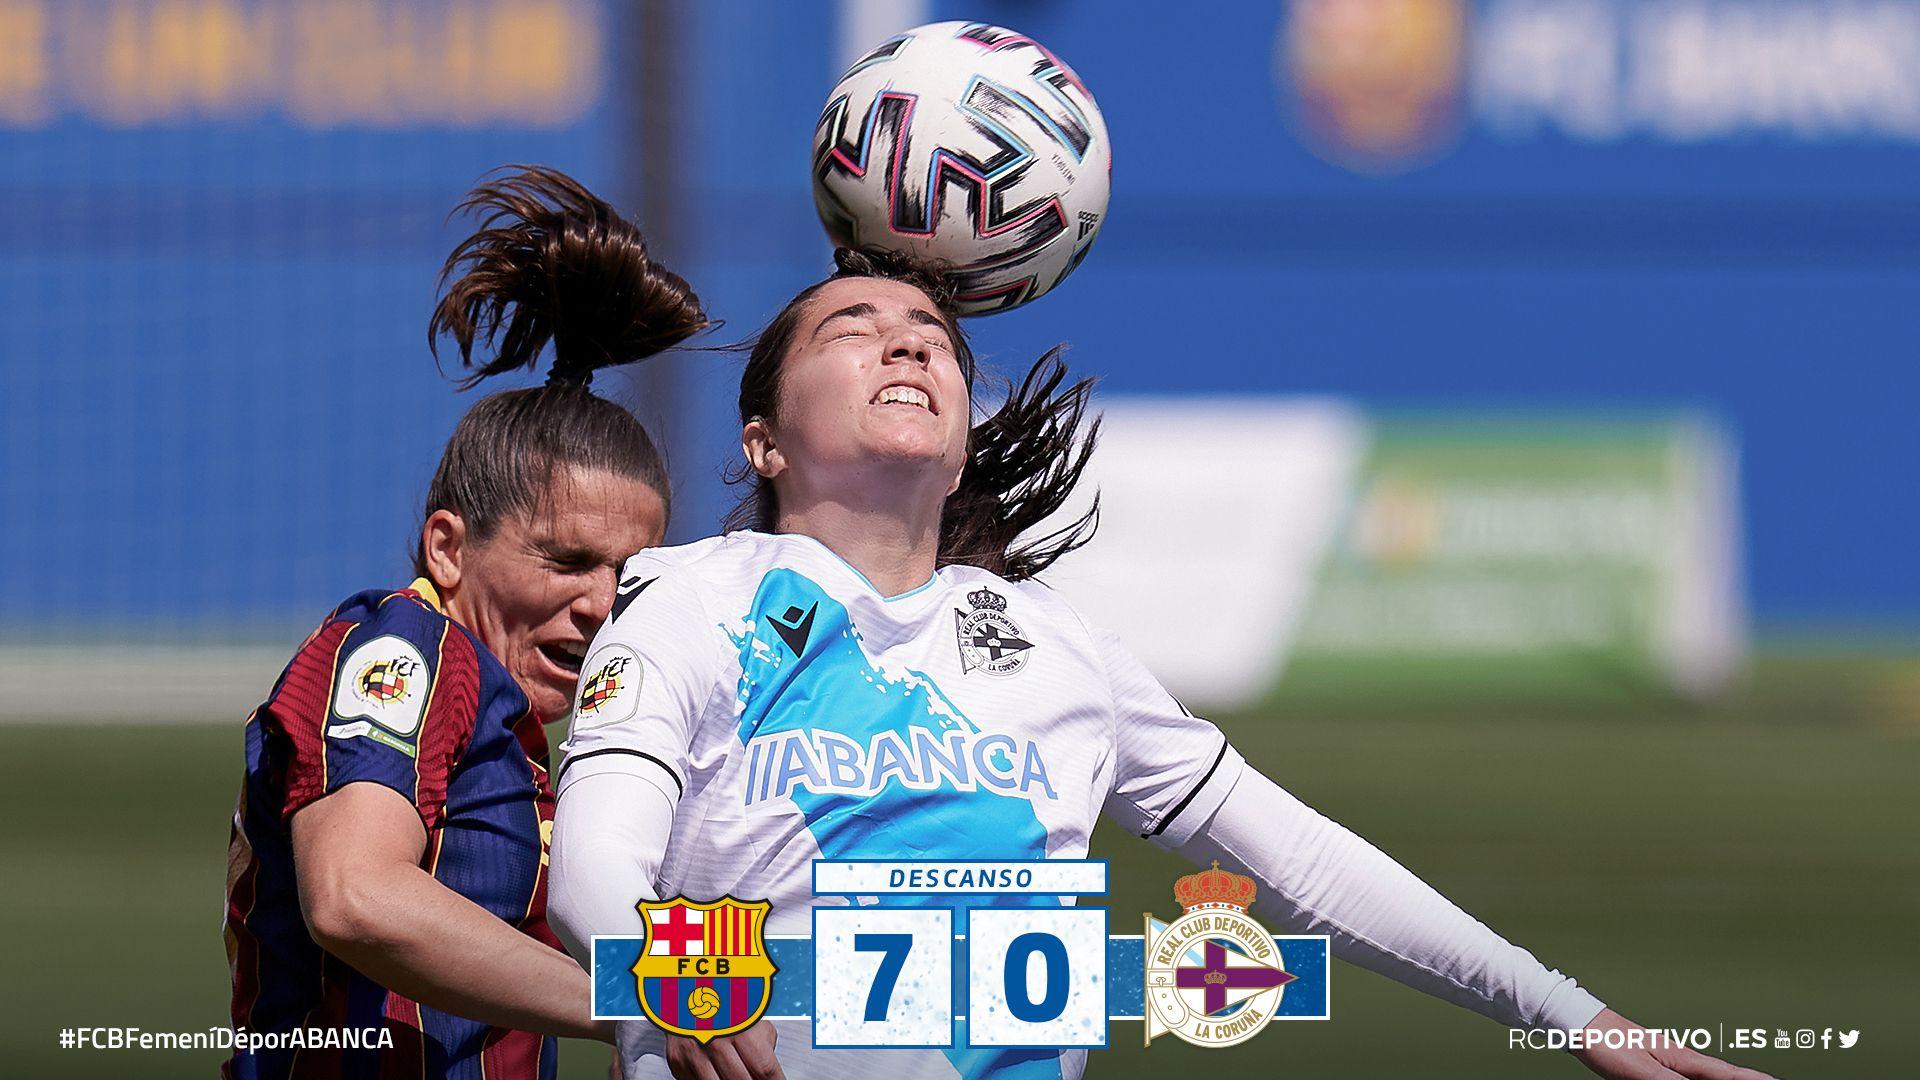 Descanso no Barça - Depor ABANCA / RCD